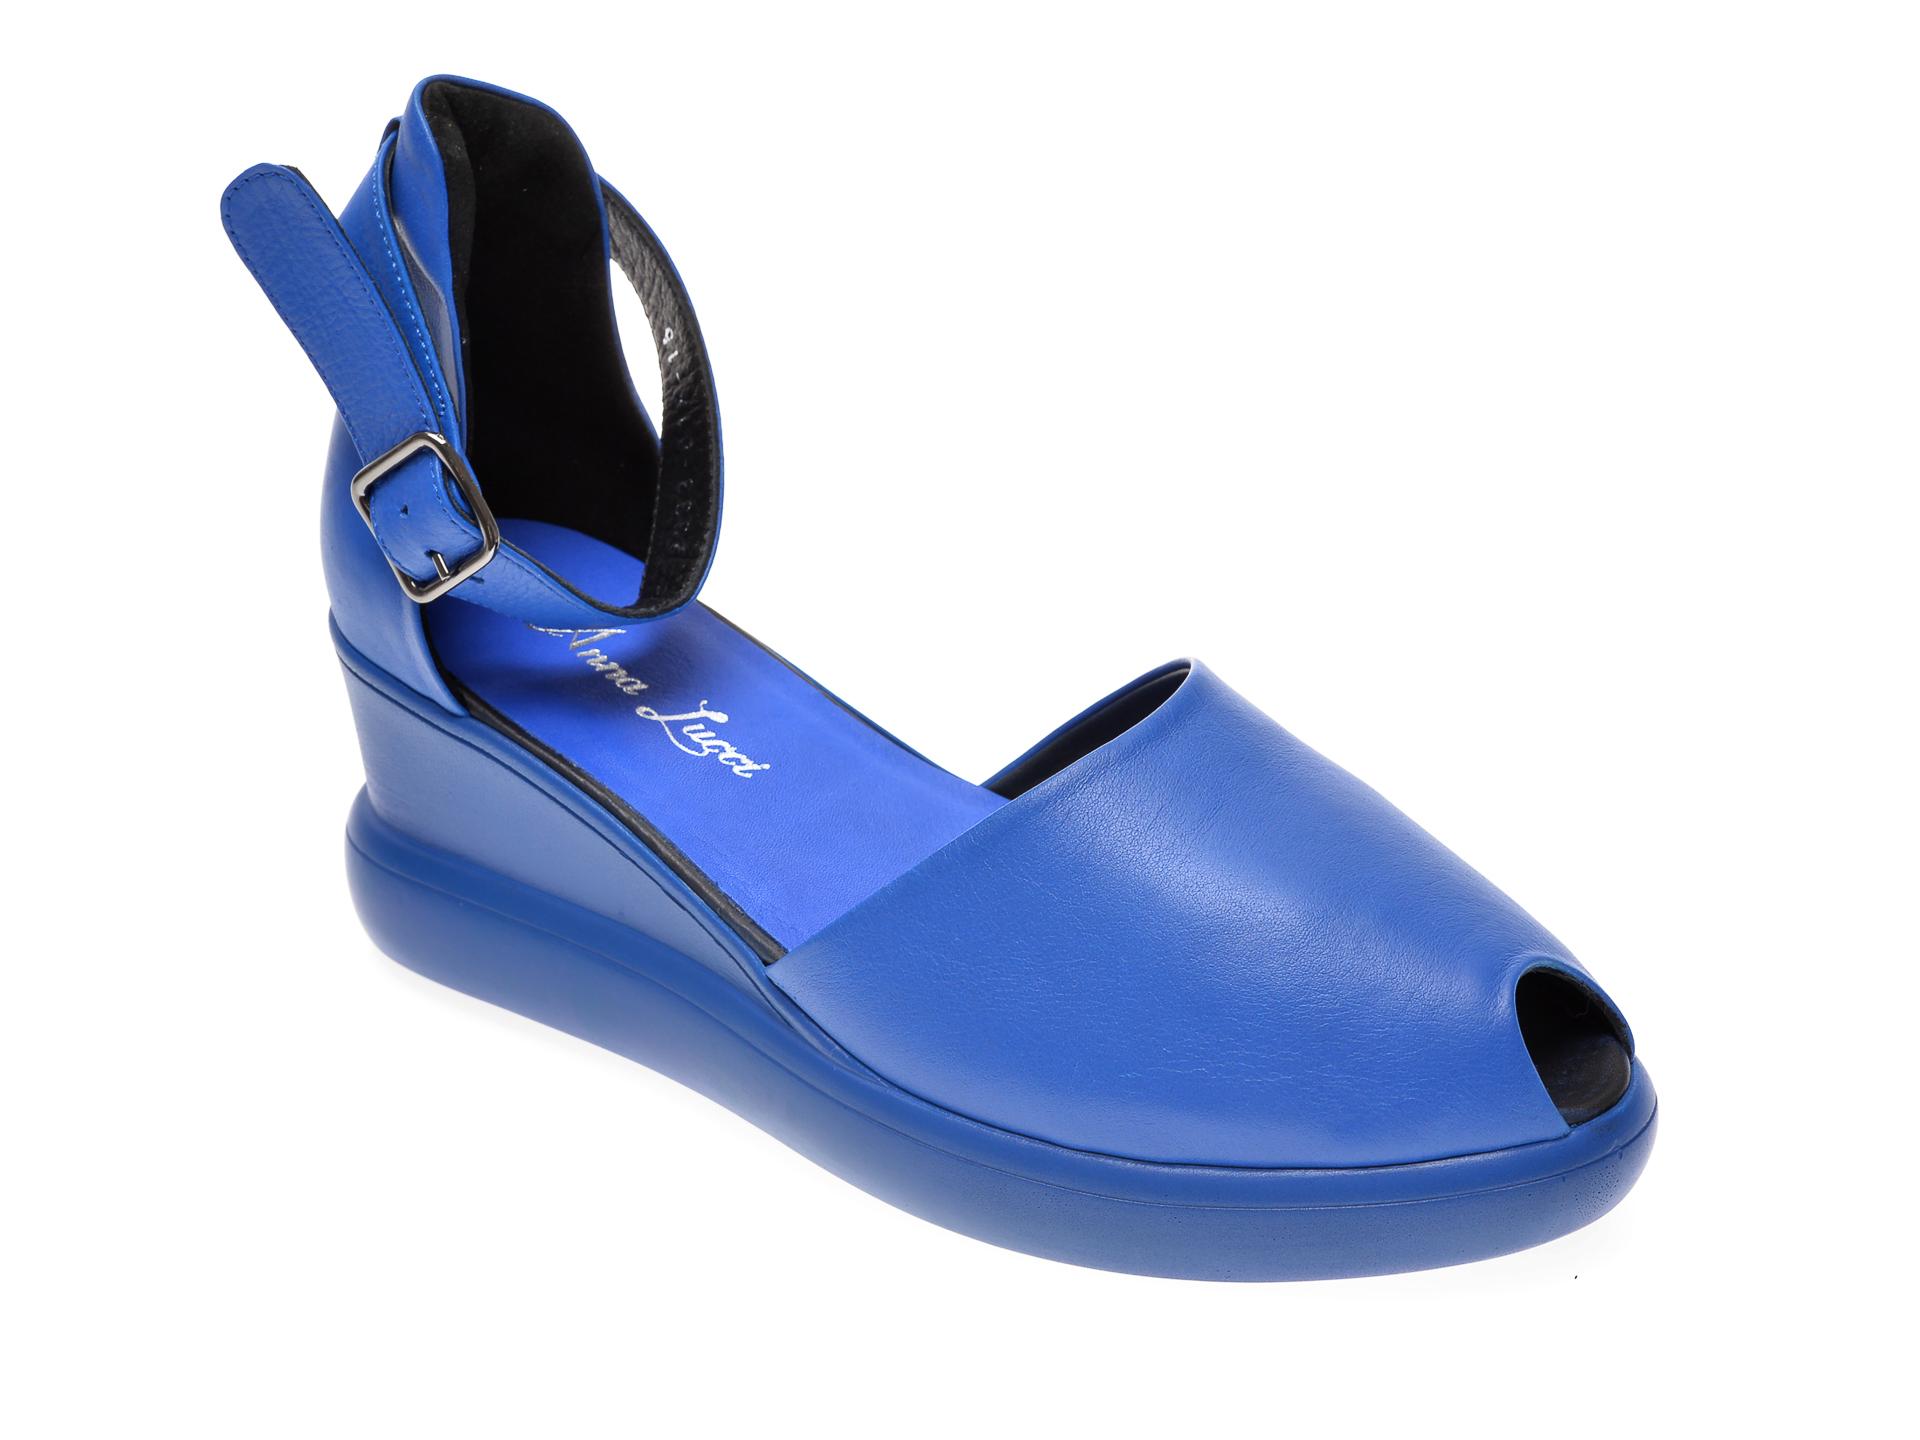 Sandale MISS LIZA albastri, 1182393, din piele naturala